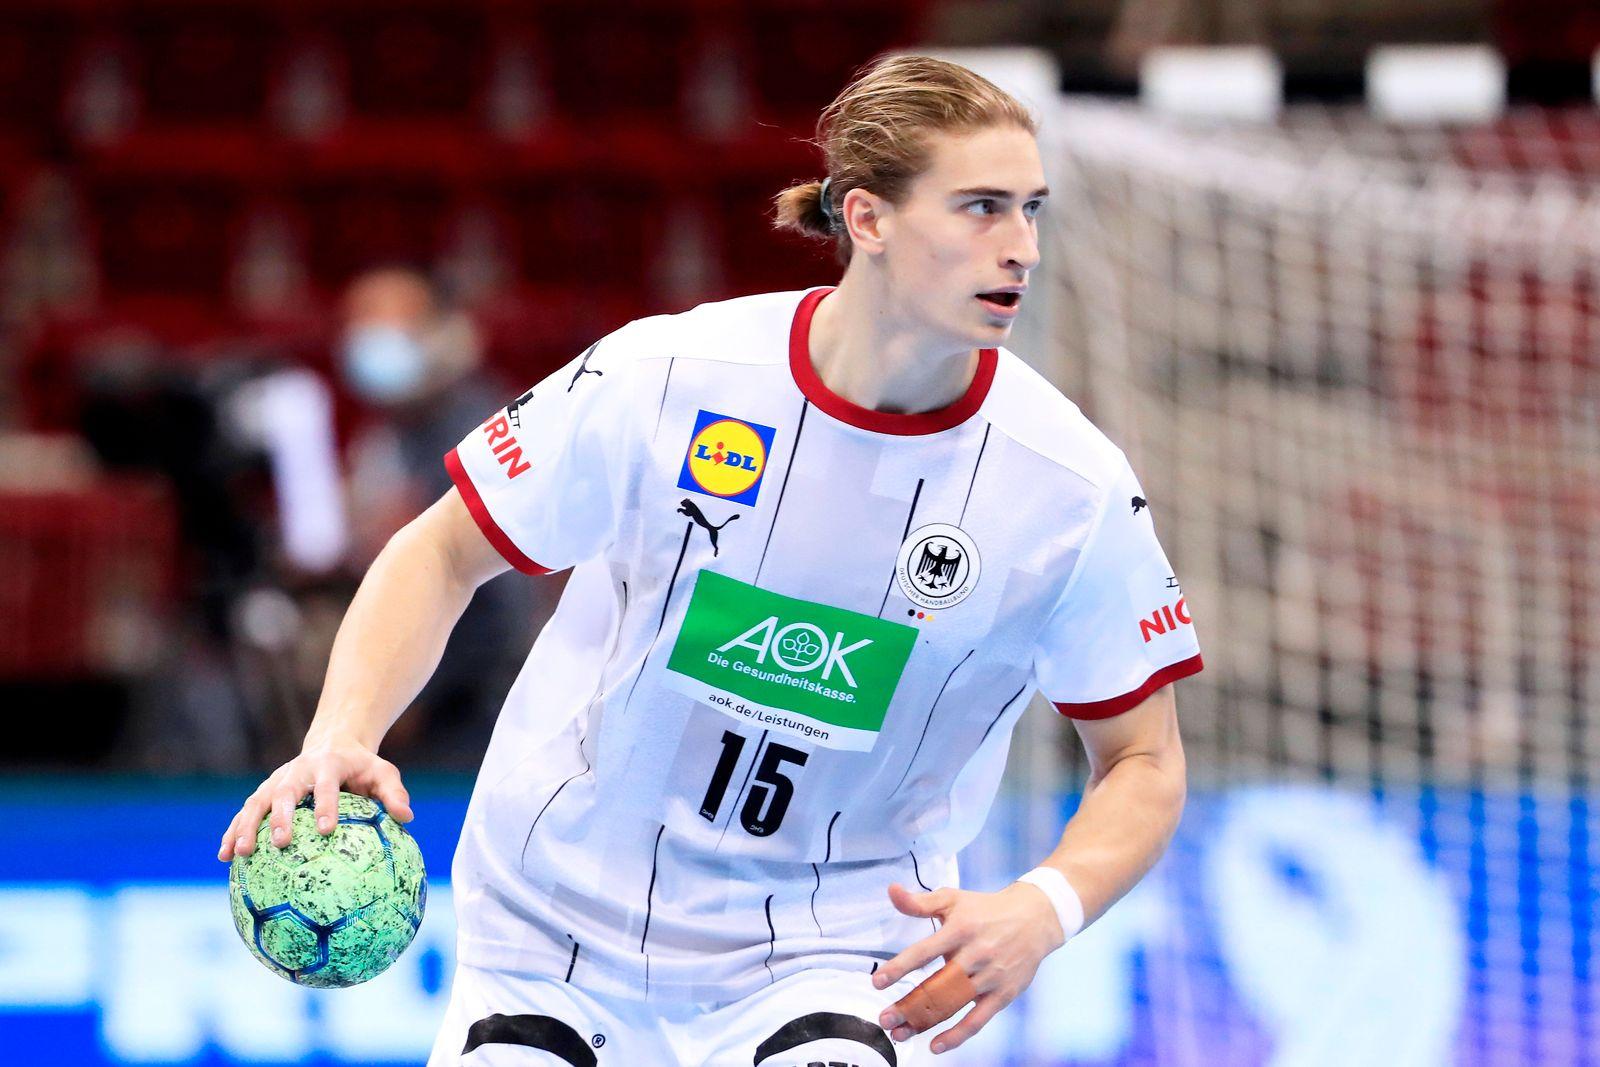 https www spiegel de sport handball handball wm 2021 juri knorr wm neuling kap verde hierauf sollten sie achten a fa6aef8f 3f1d 4124 a016 7c2b8b483dcf